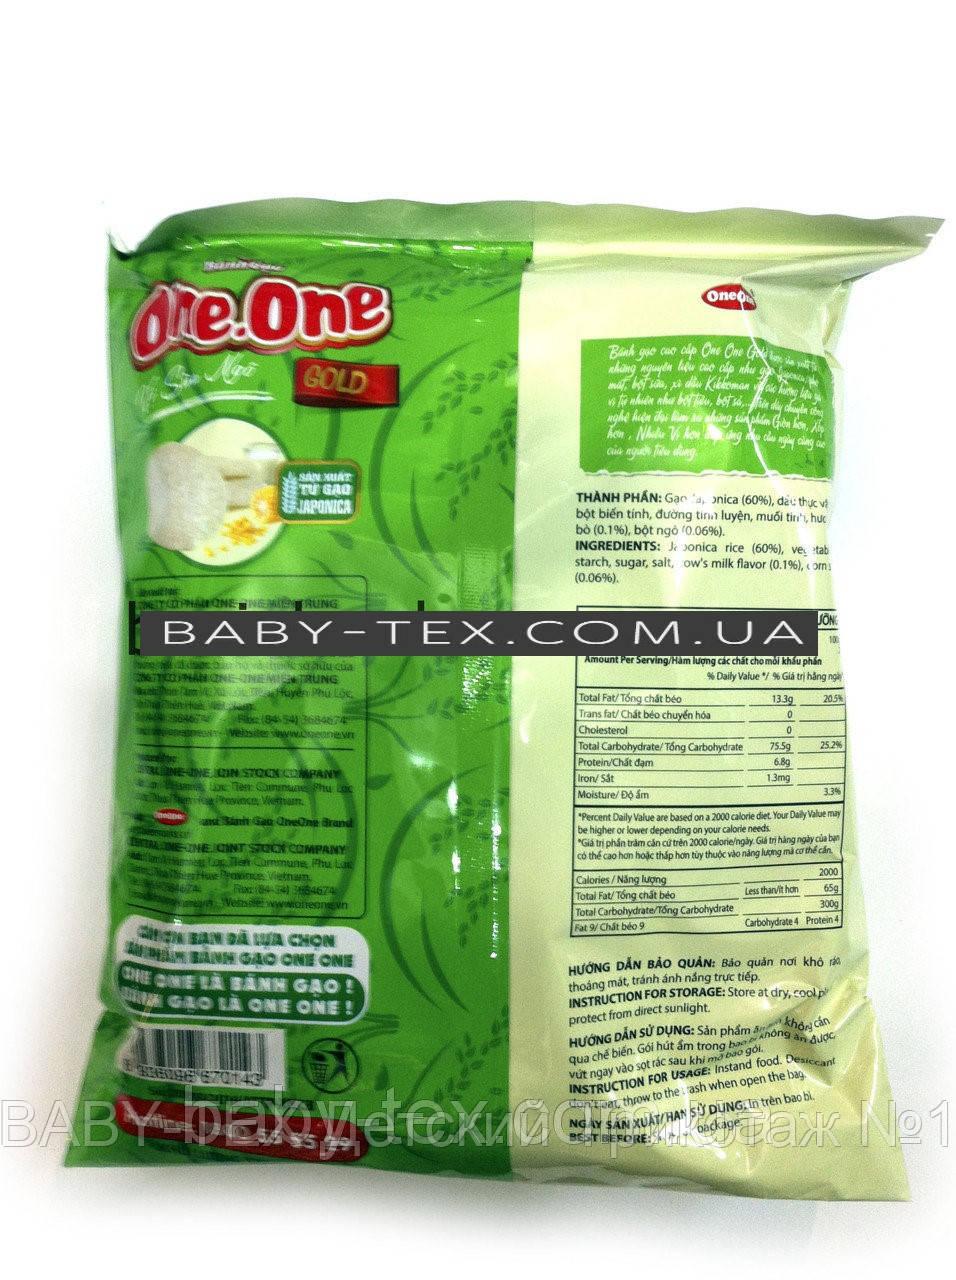 Рисовое печенье One-One Gold с молоком и кукурузой 122г. (Вьетнам)